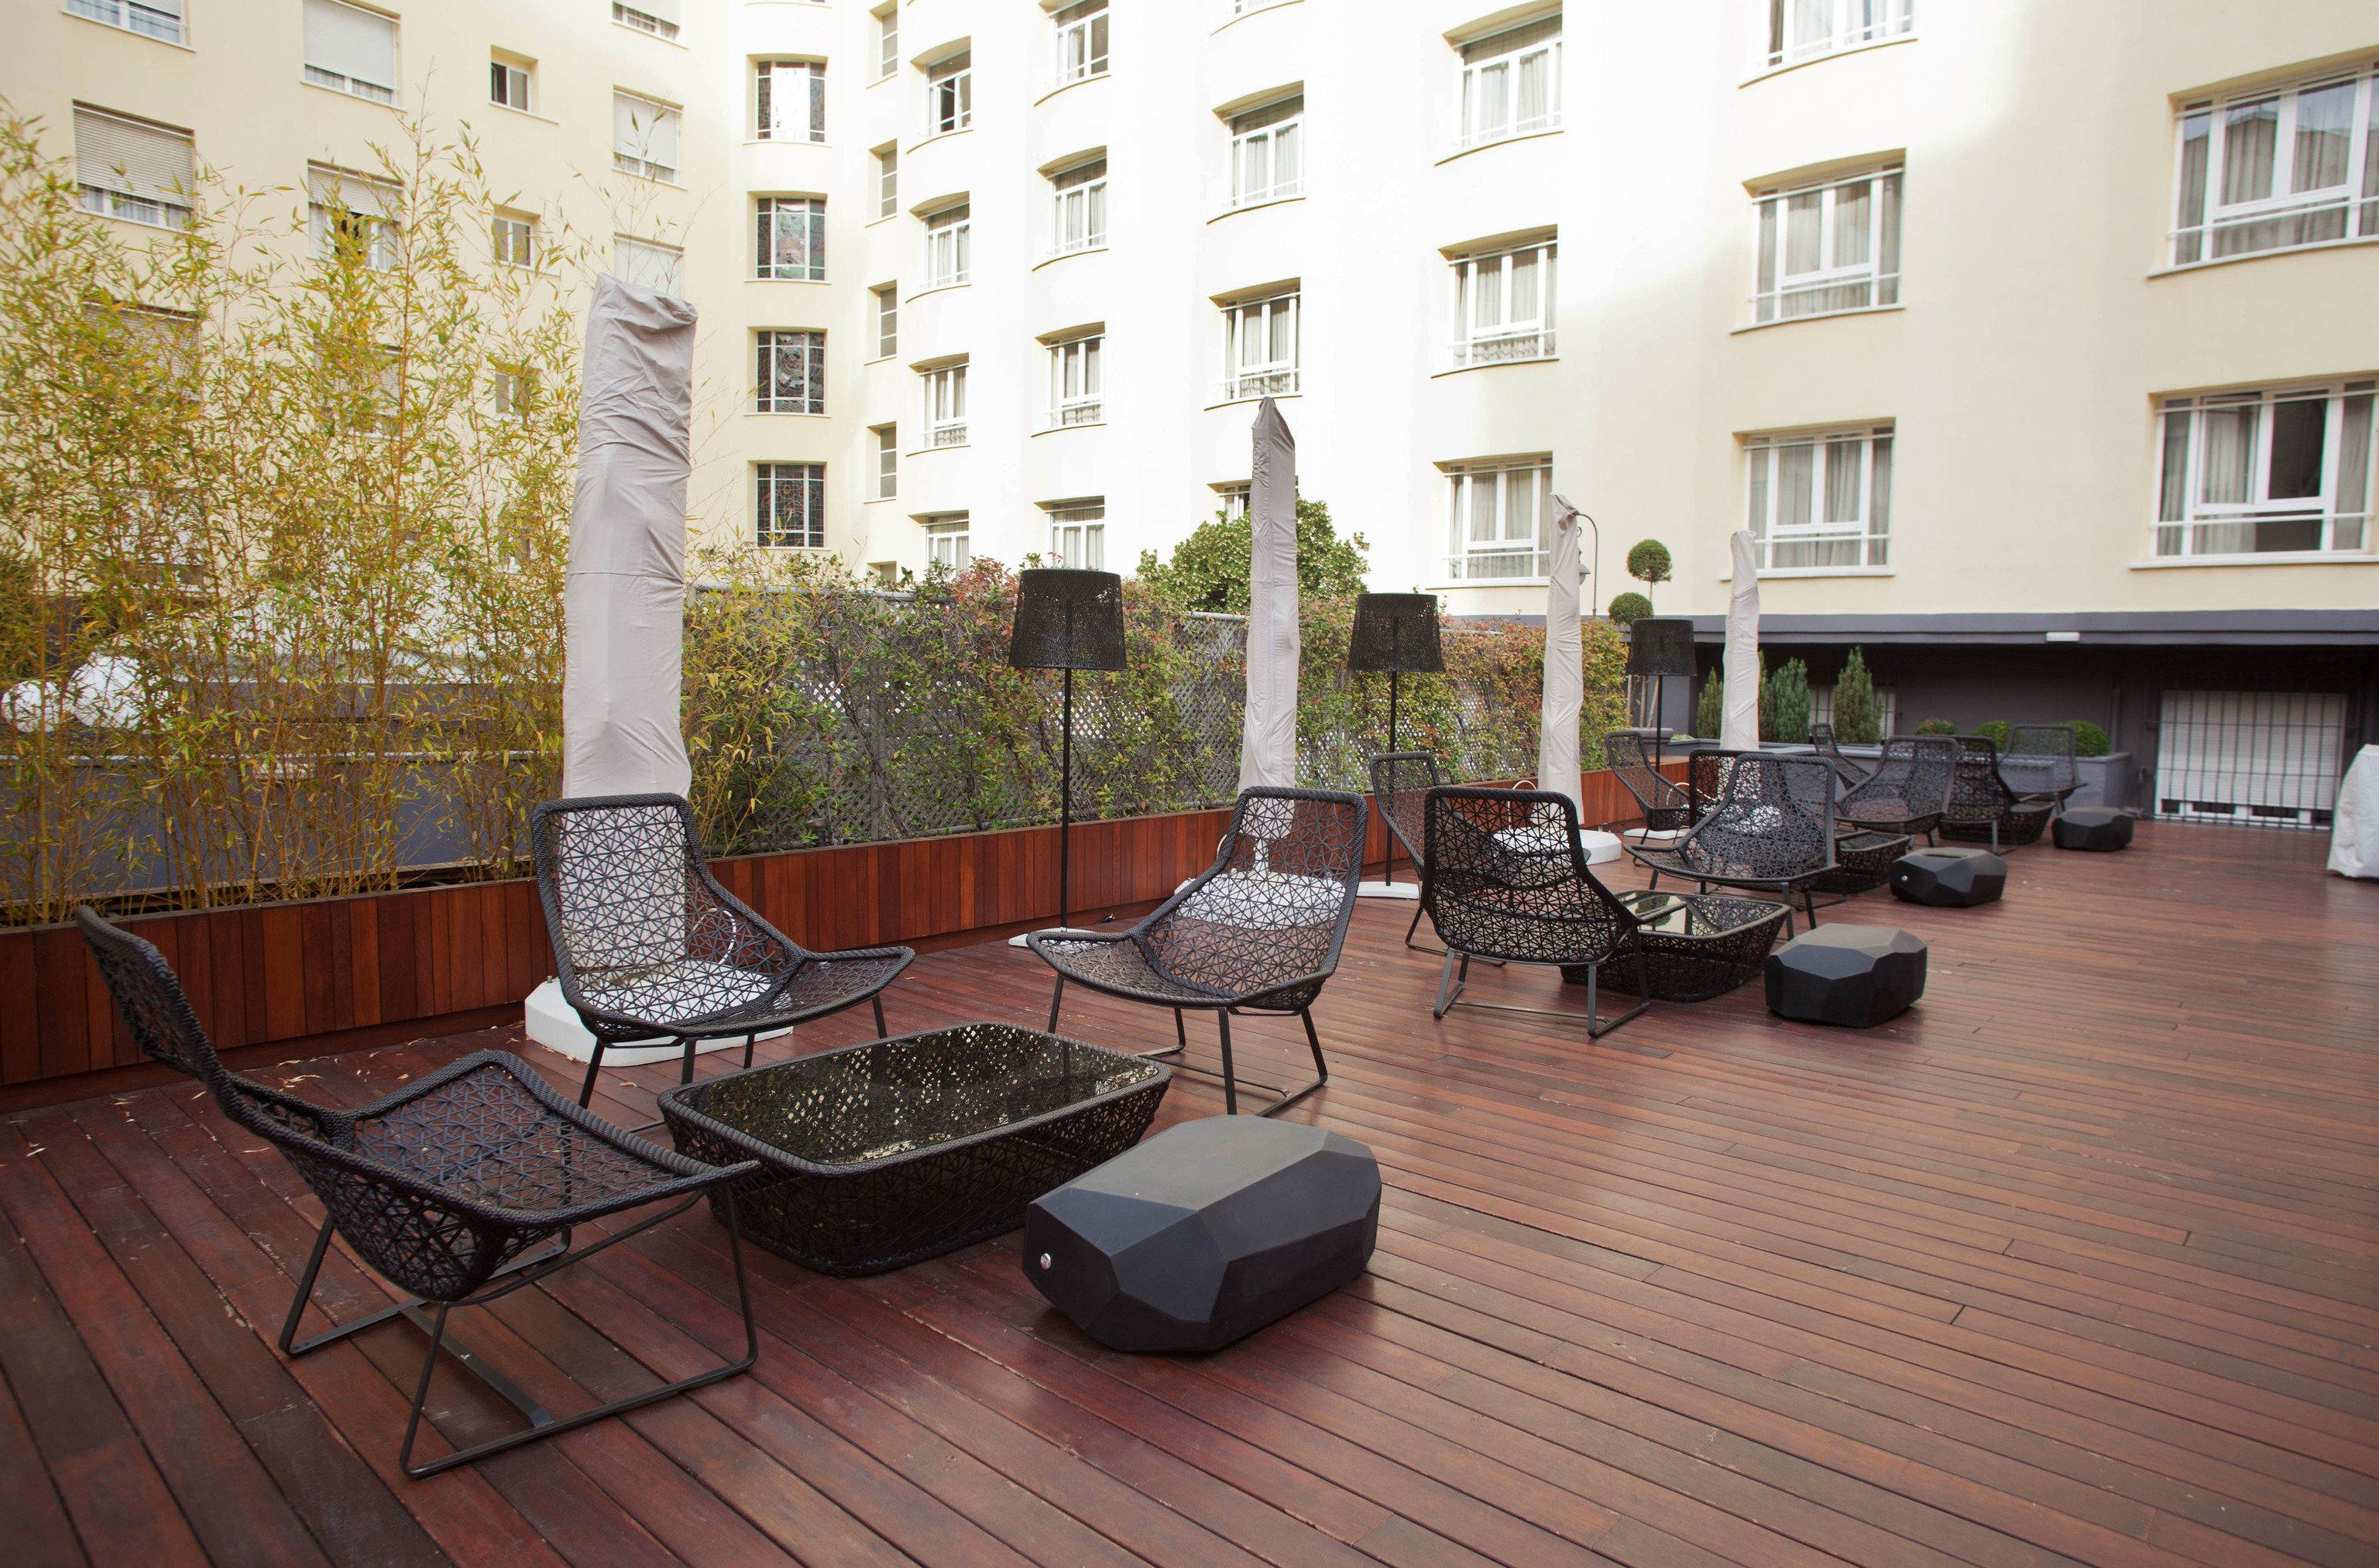 property condominium Courtyard home outdoor structure backyard cottage Villa